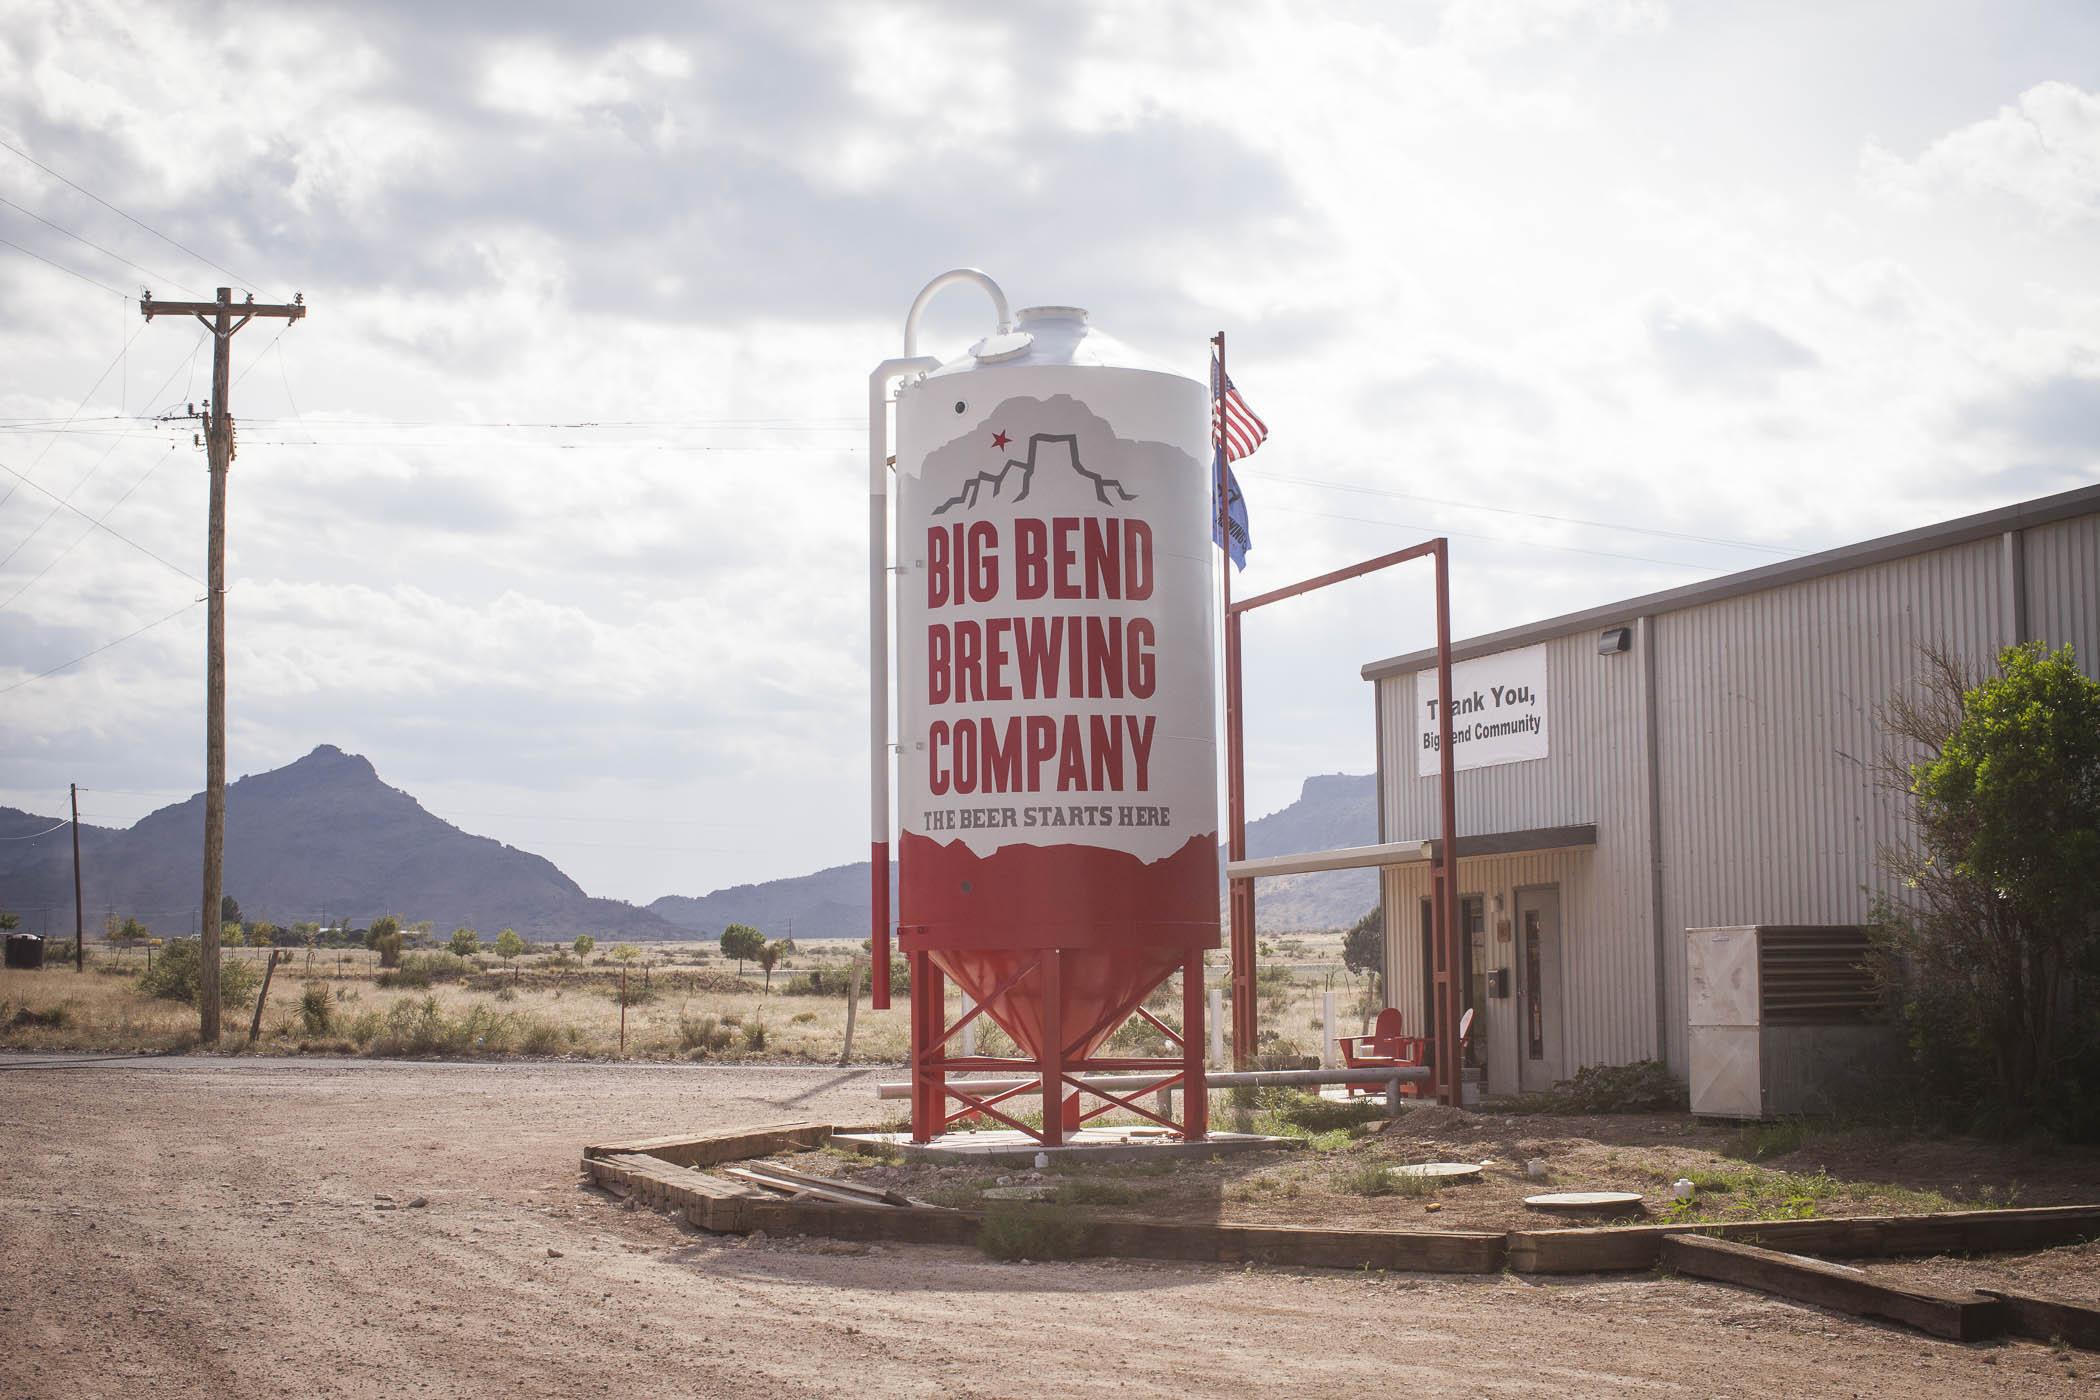 DETOUR: Alpine, TX – Big Bend Brewing Co.